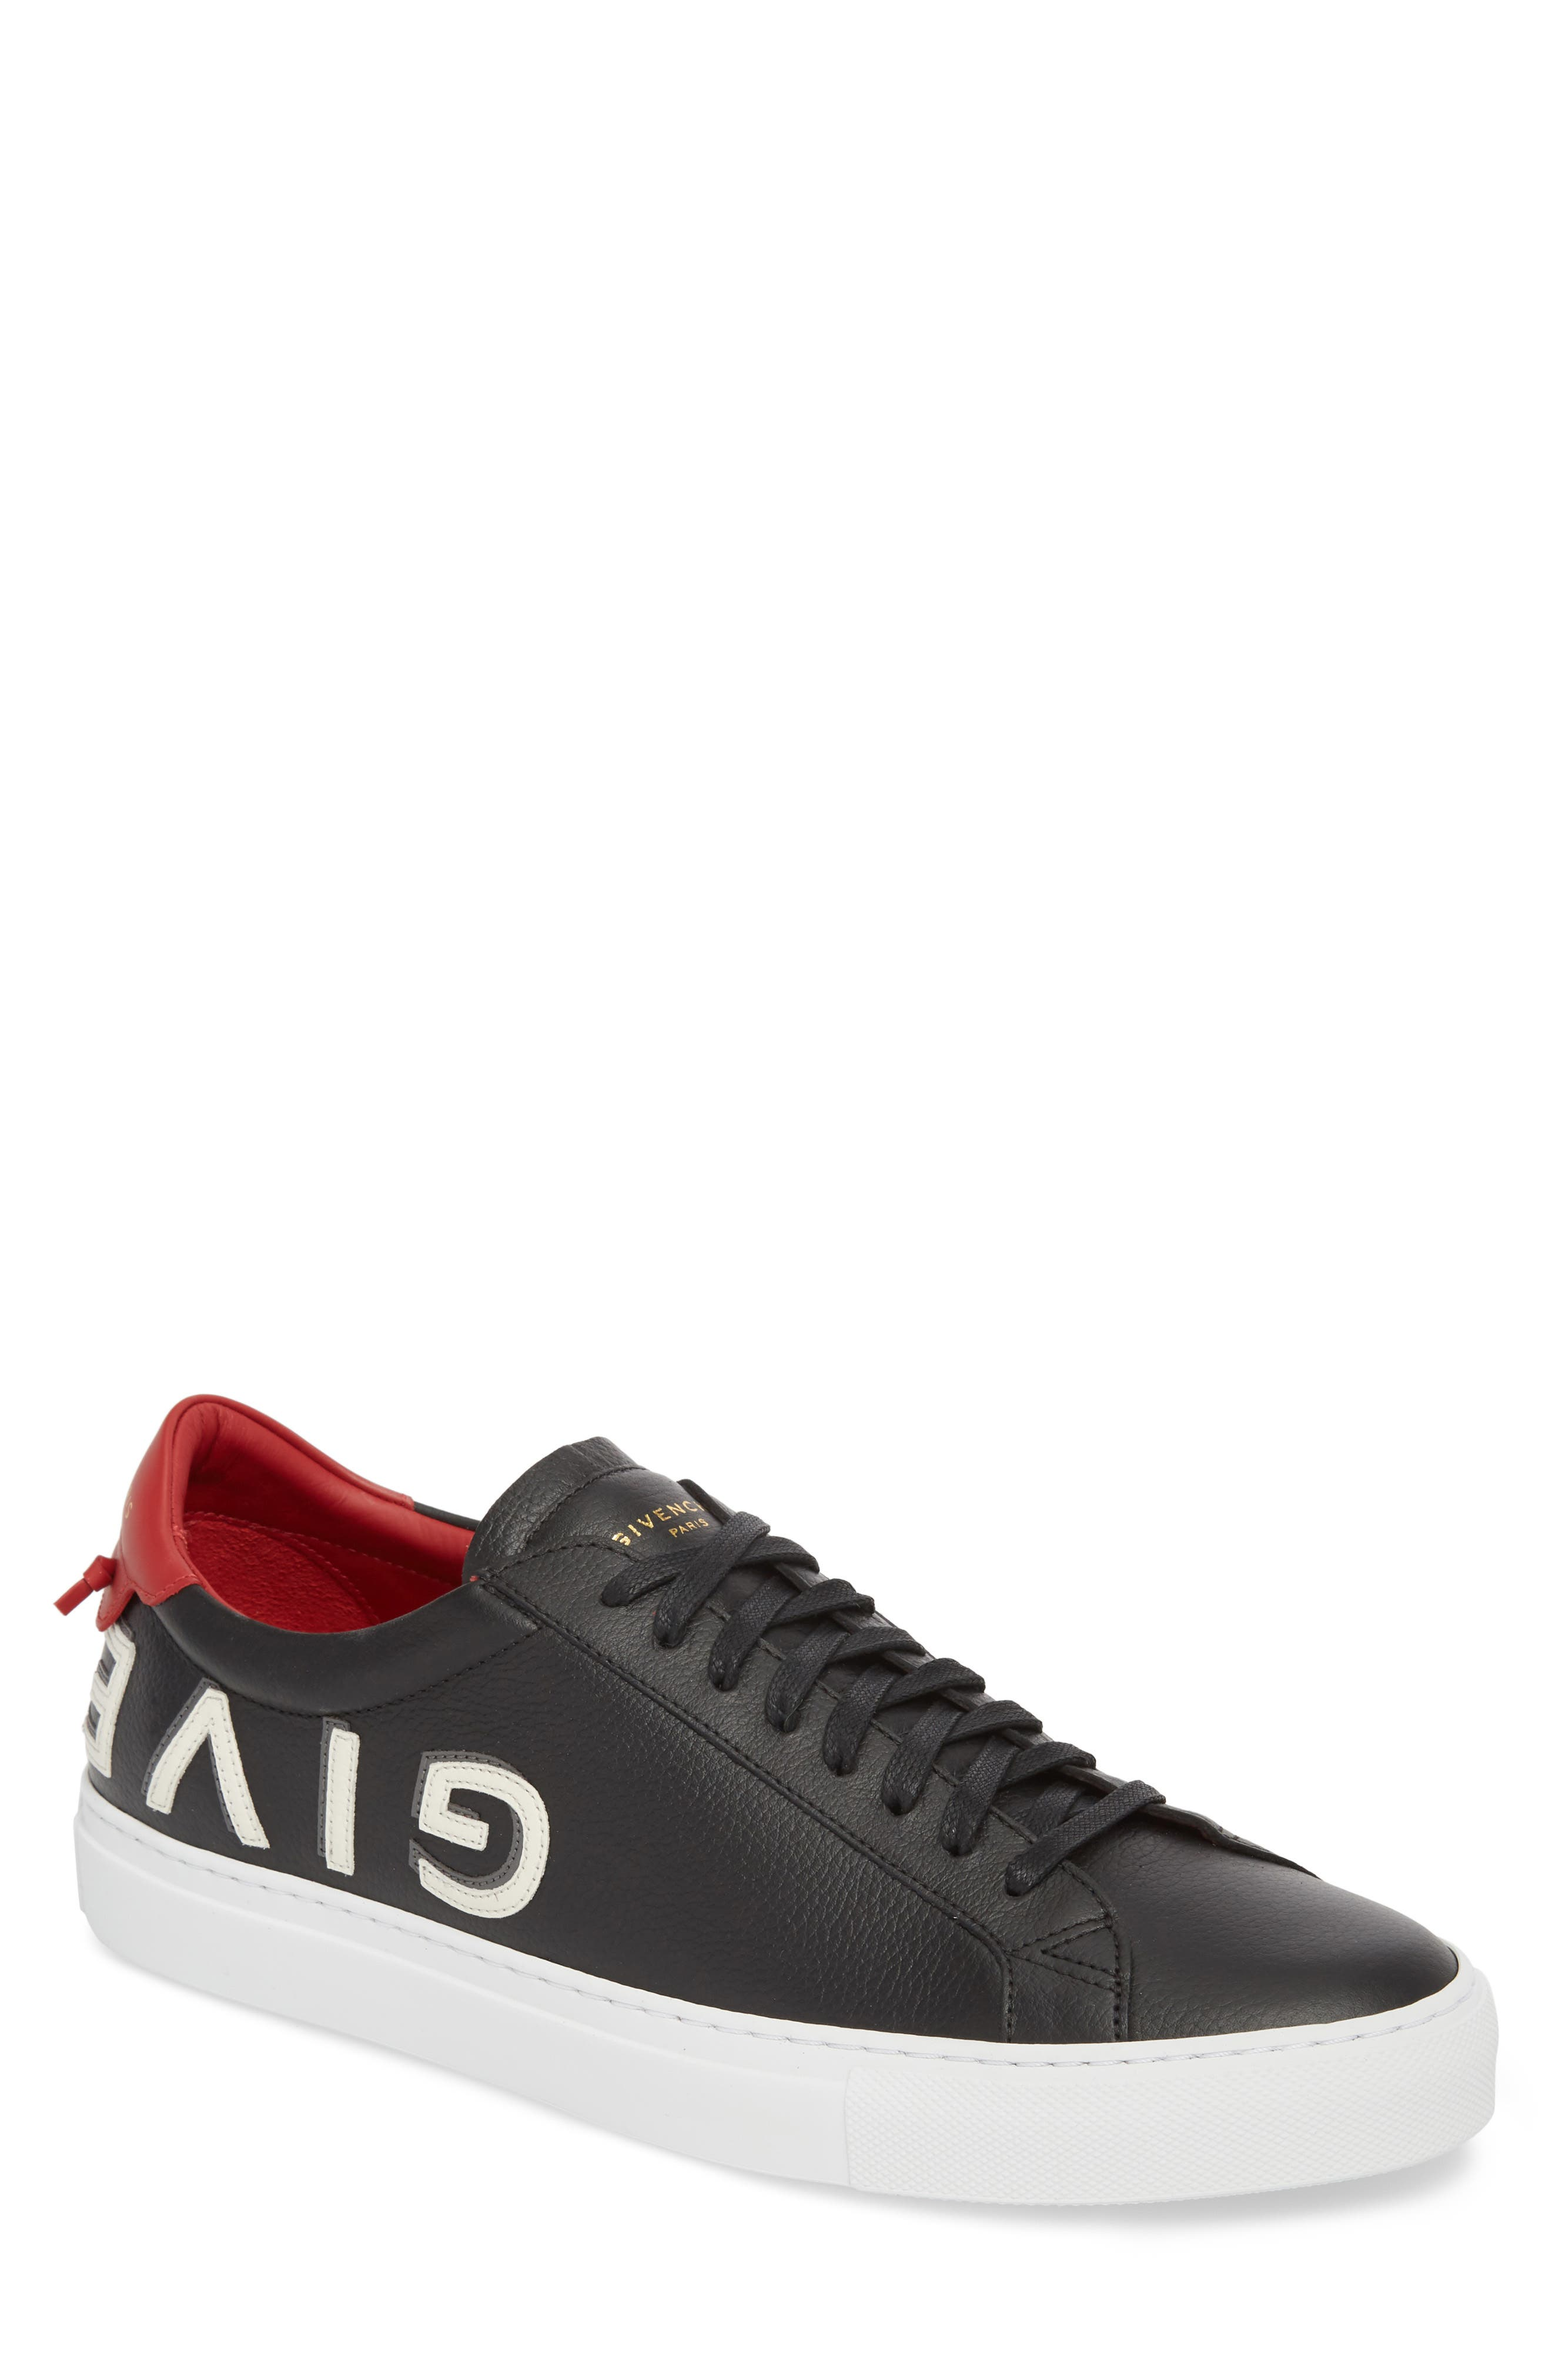 Urban Street Upside Down Sneaker,                         Main,                         color, Black/ Red